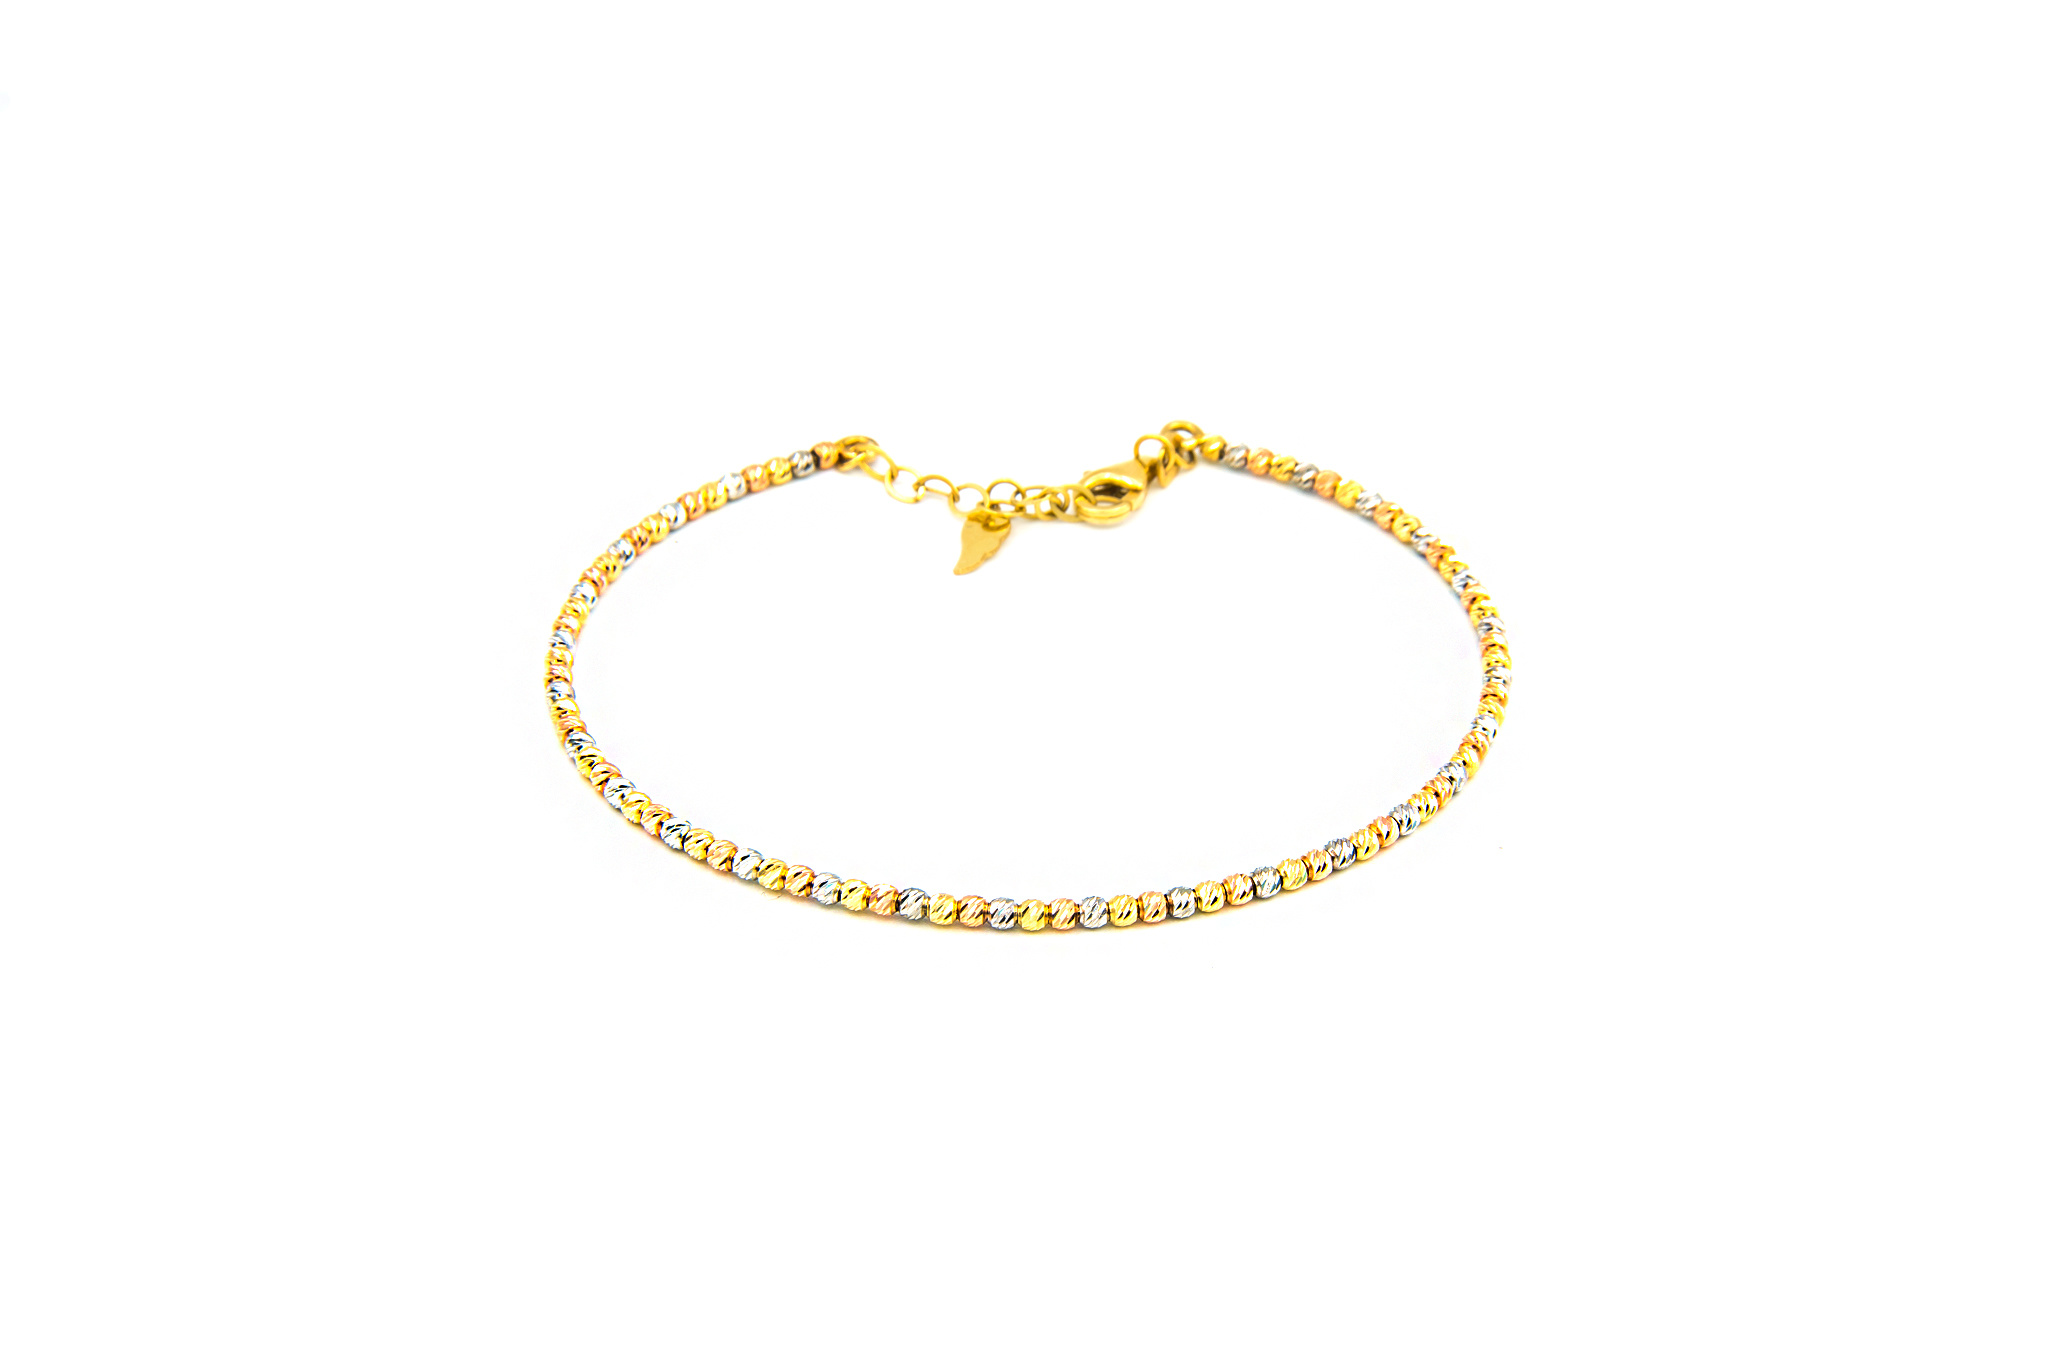 Armband vast diamond cut balletjes tricolor-2